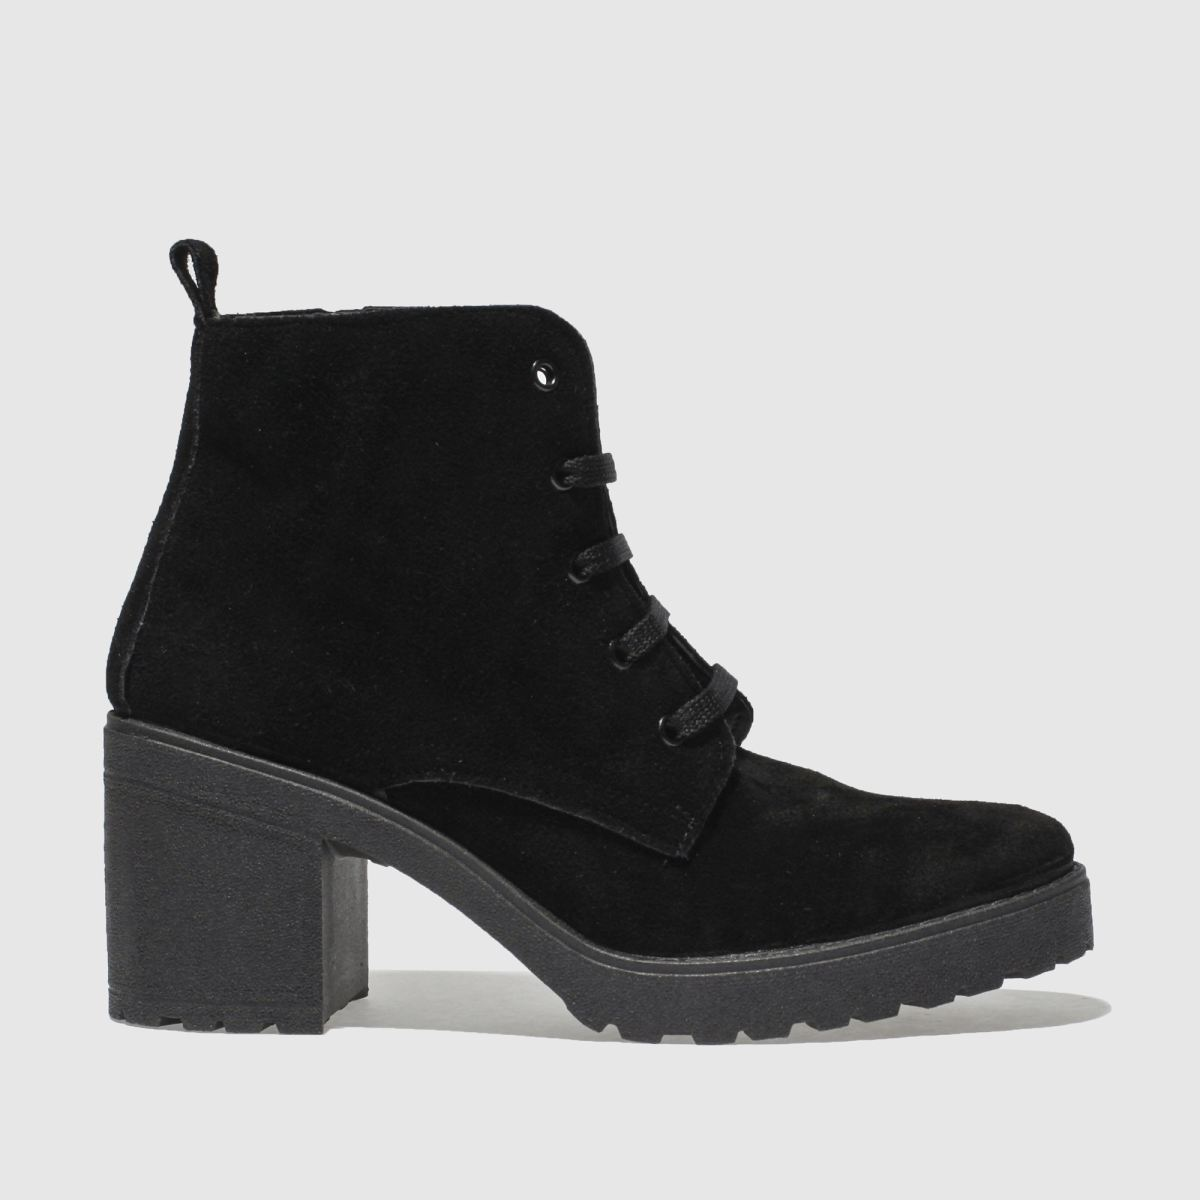 Schuh Black Chatty Boots